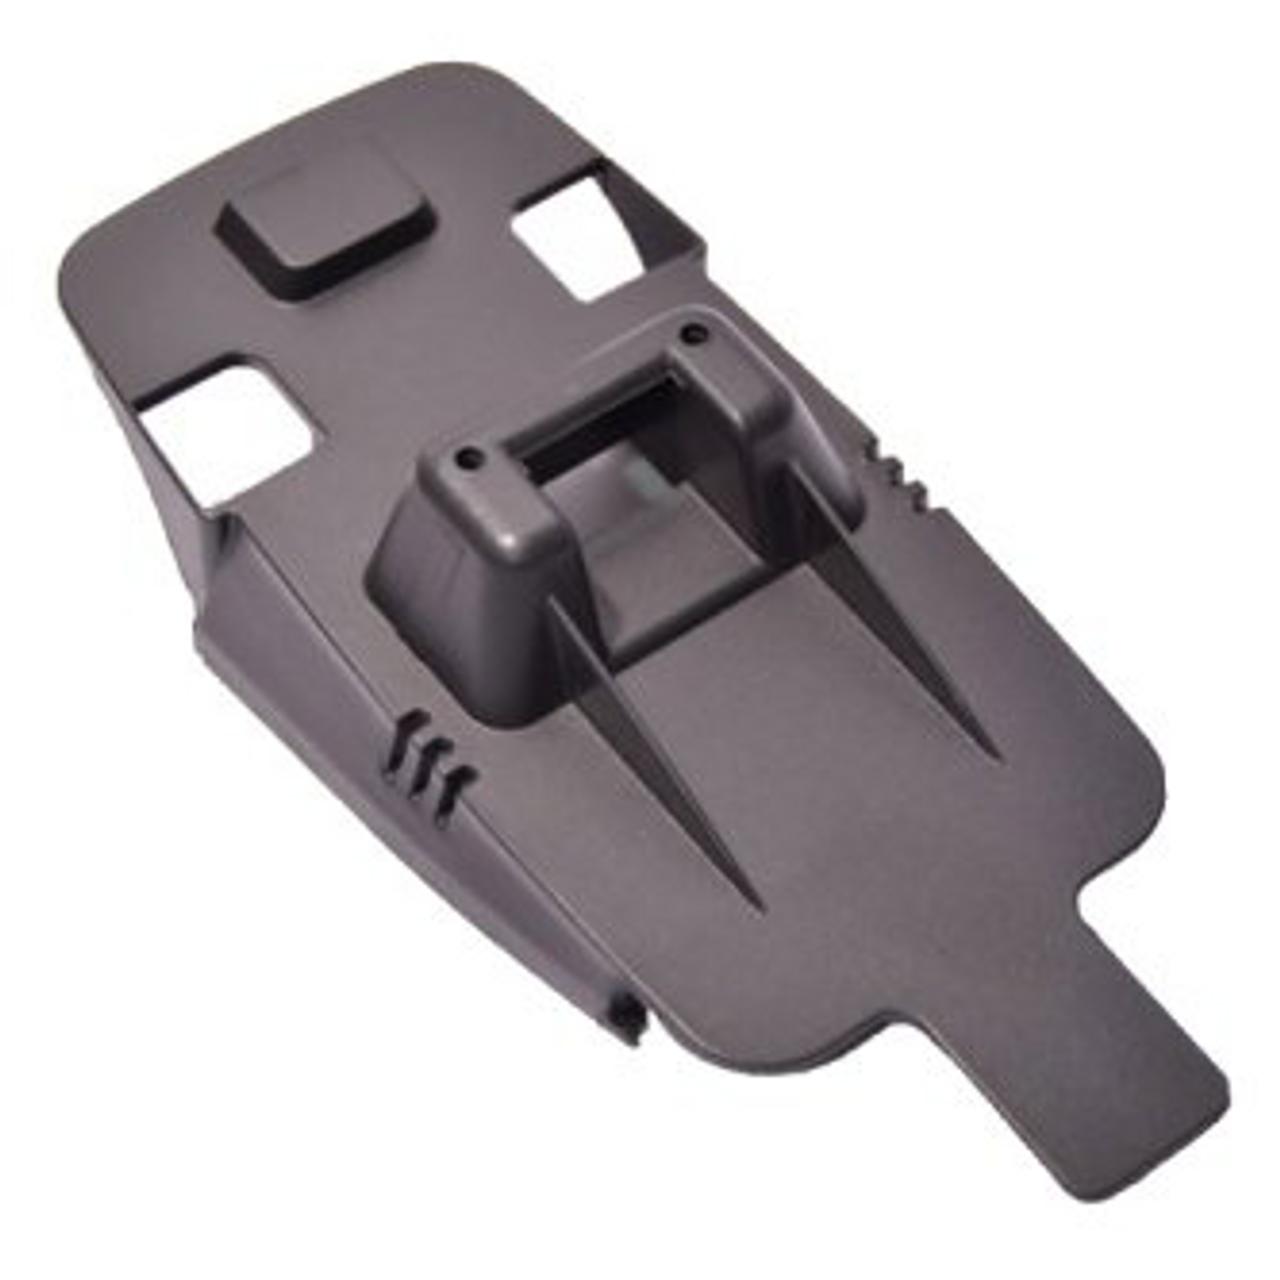 Ingenico iWL 220/250/252/281 FlexiPole POS Drive-Thru Handle